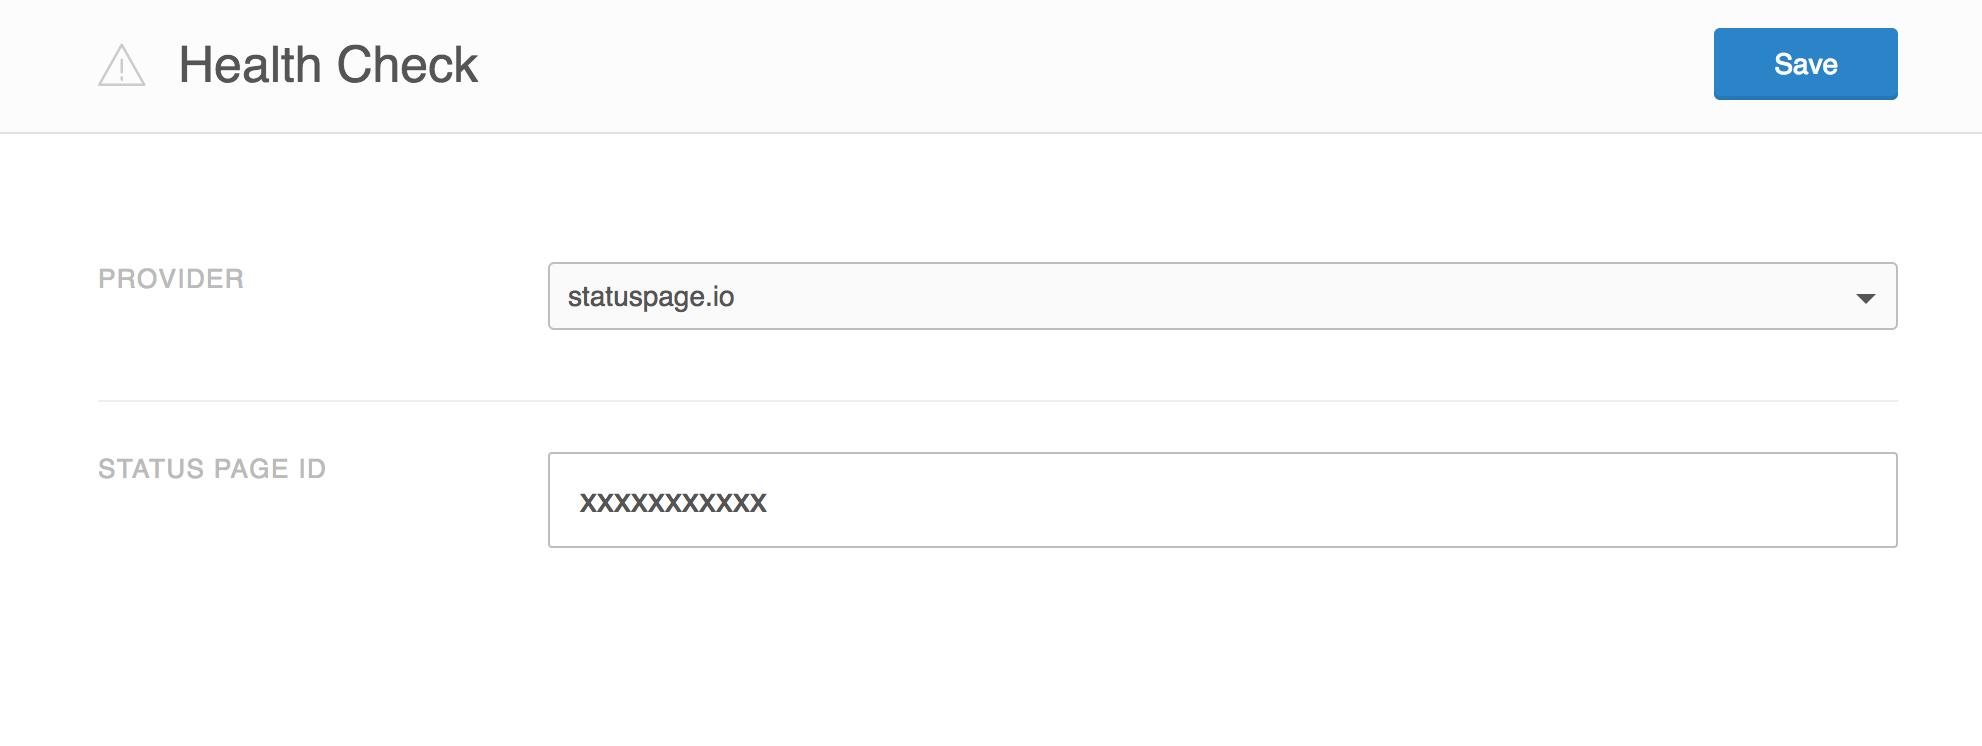 Screenshot showing statuspage.io health check provider.